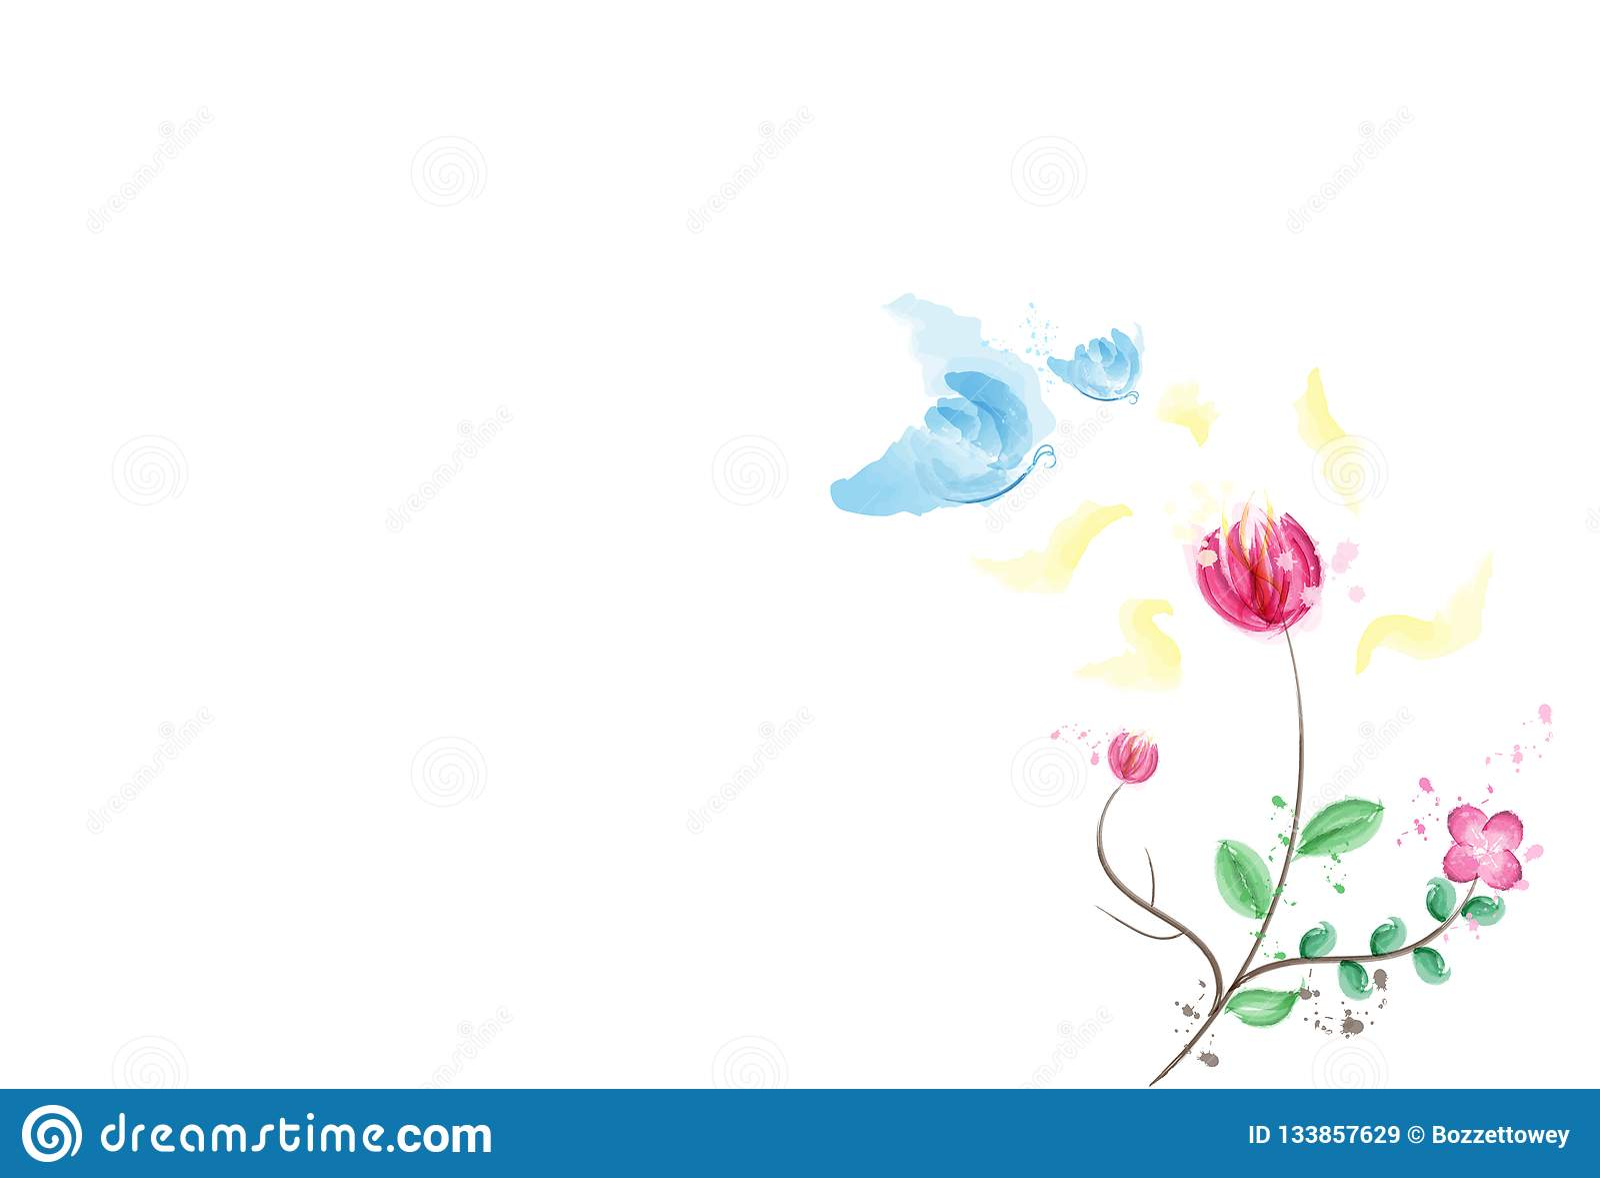 Watercolor, πεταλούδα με τη γύρη του λουλουδιού, φύση μελανιού splatter